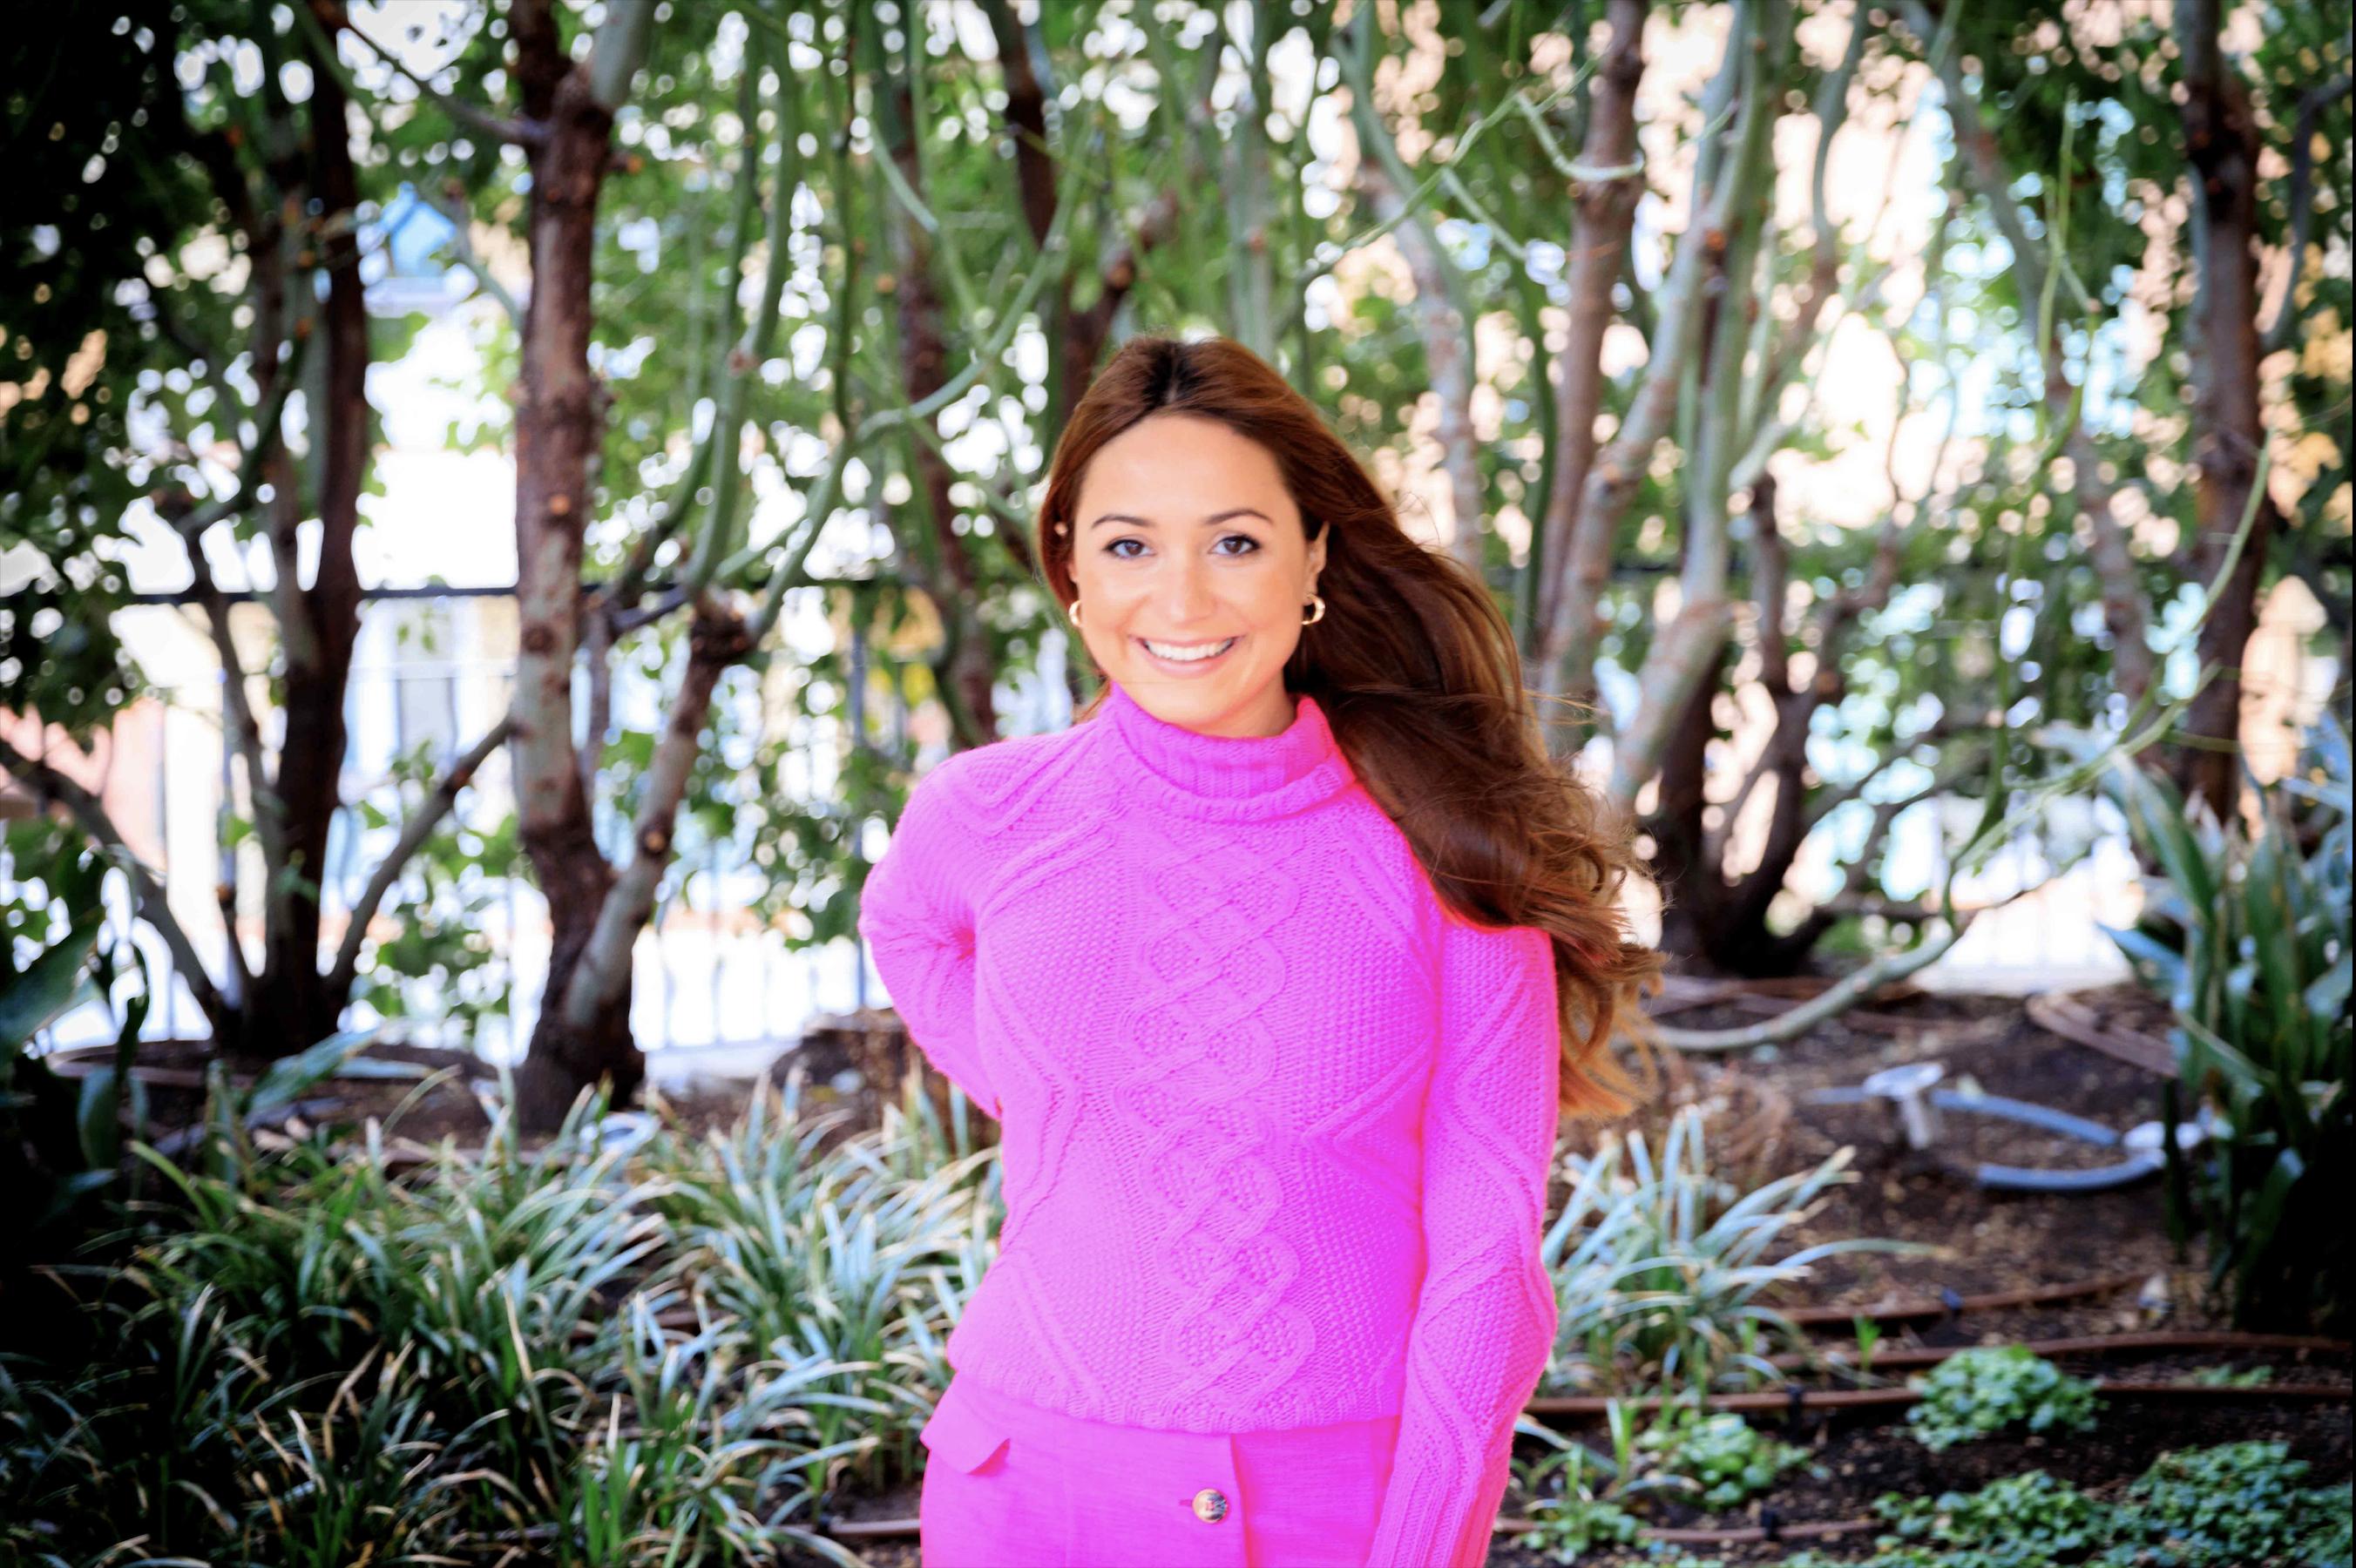 girl-pink-outfit-auburn-hair